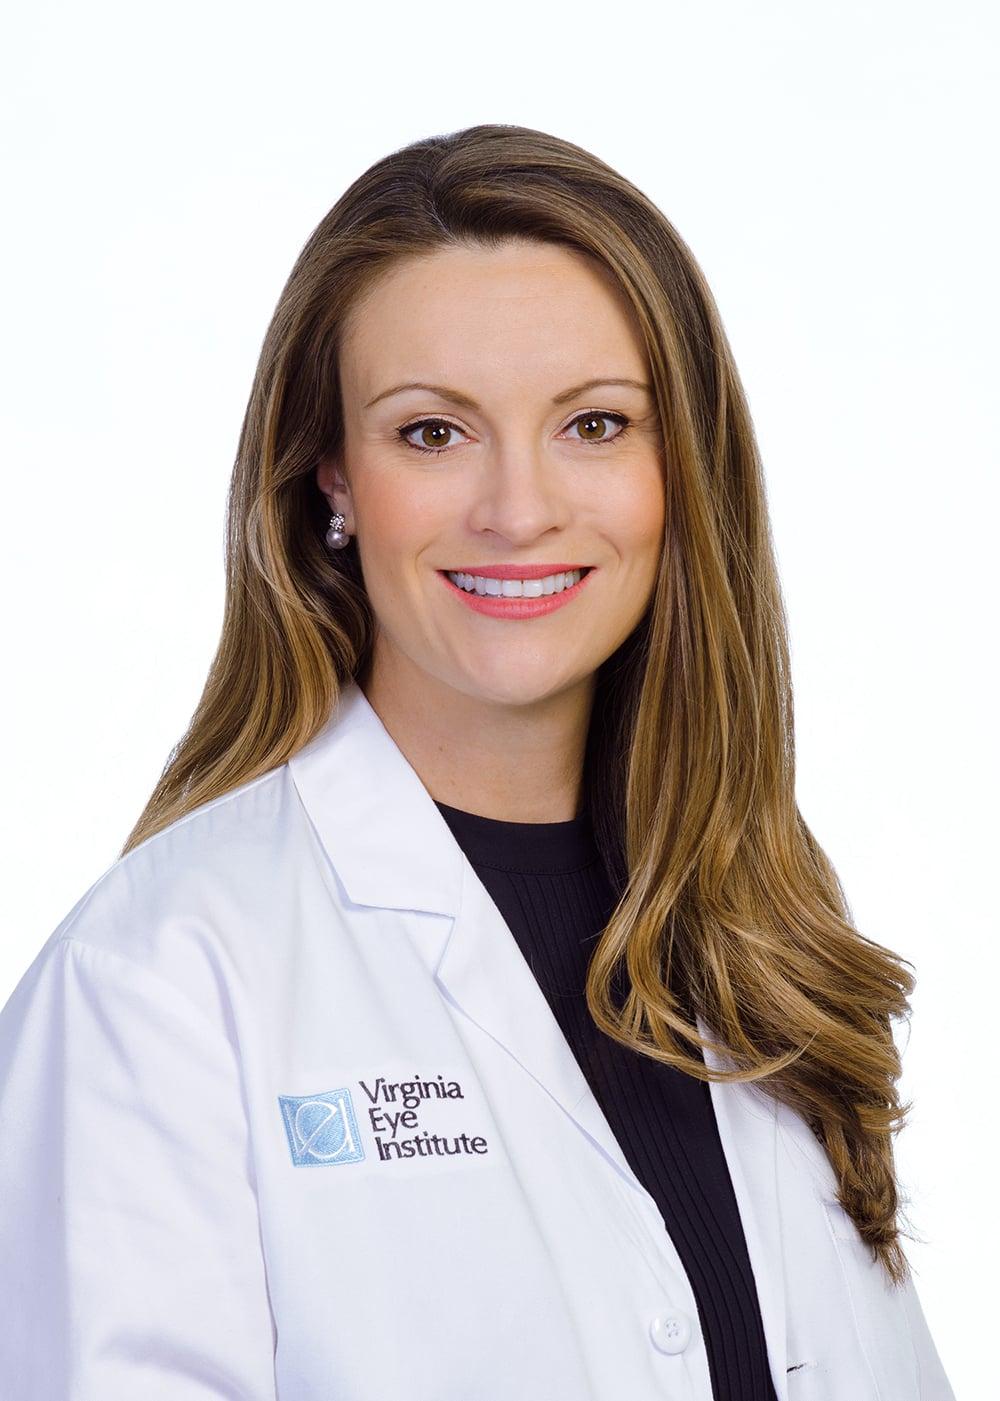 Virginia Eye Institute Provider - Nicole A. Langelier M.D., M.B.E.